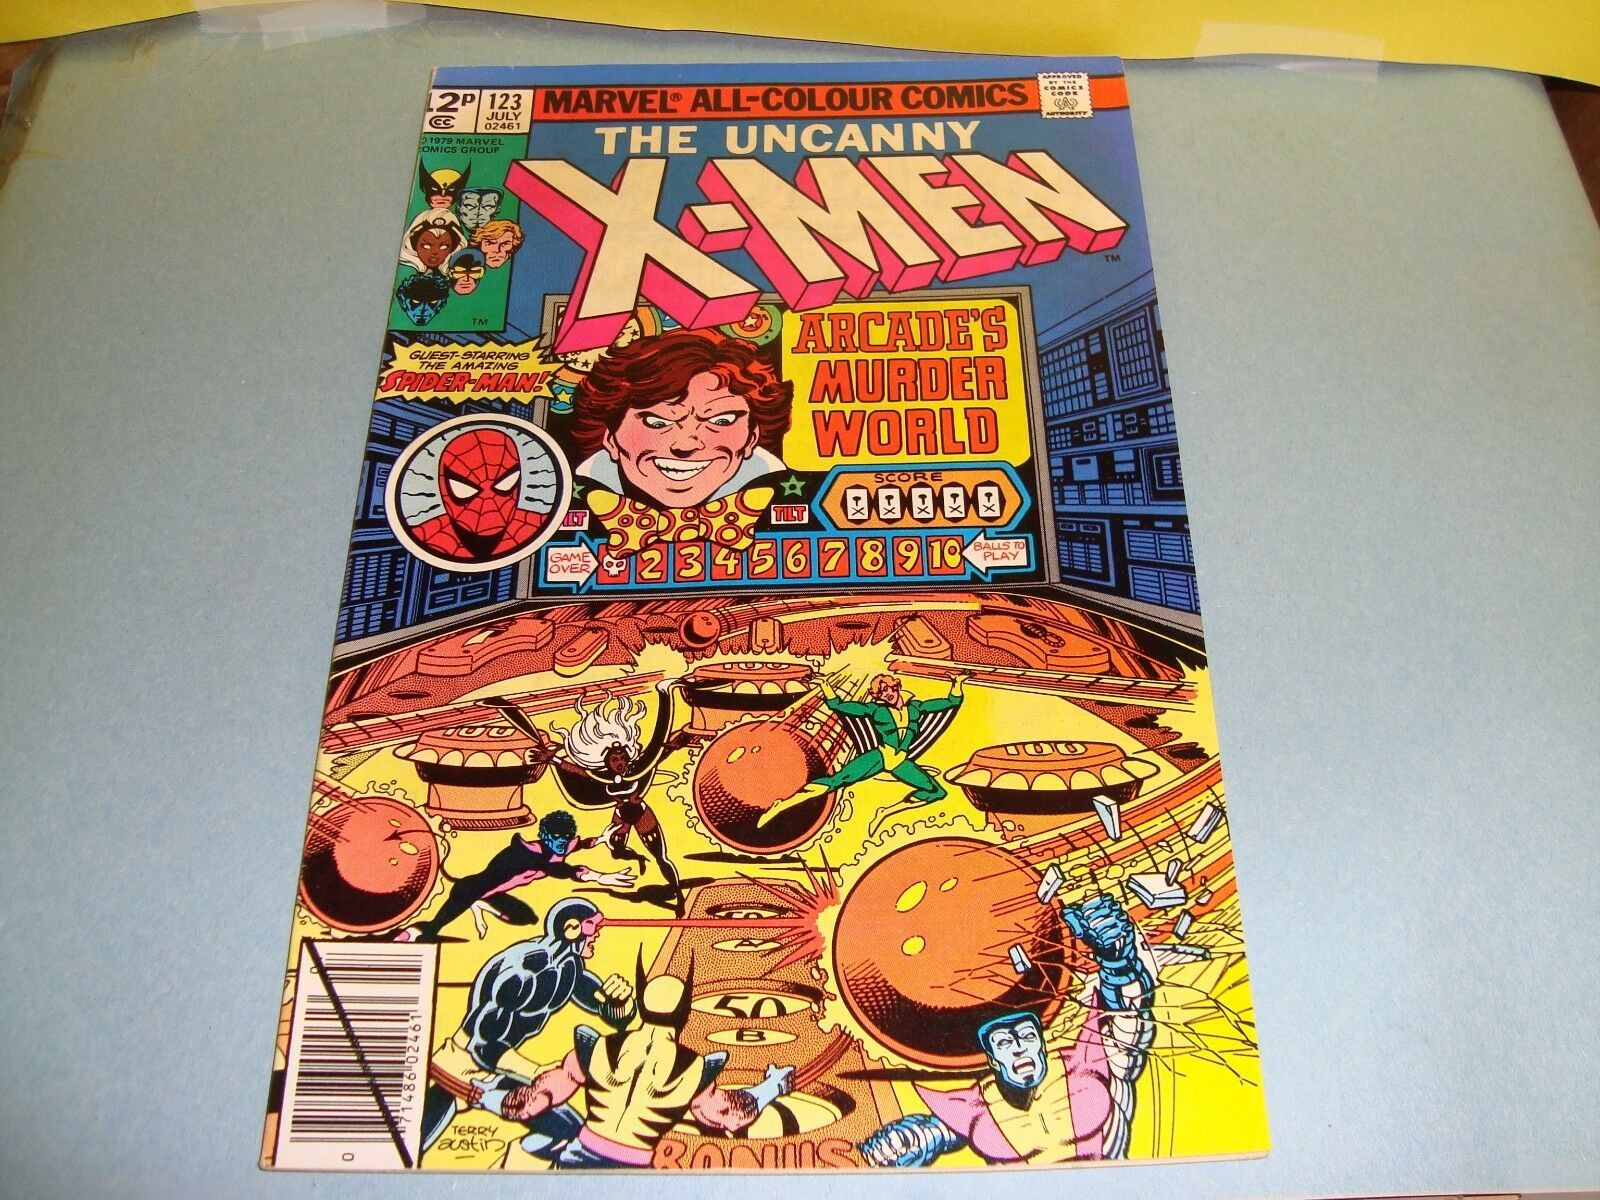 Uncanny X-Men #123 Original Marvel Comic Book from 1979 Spider-Man / Storm VF